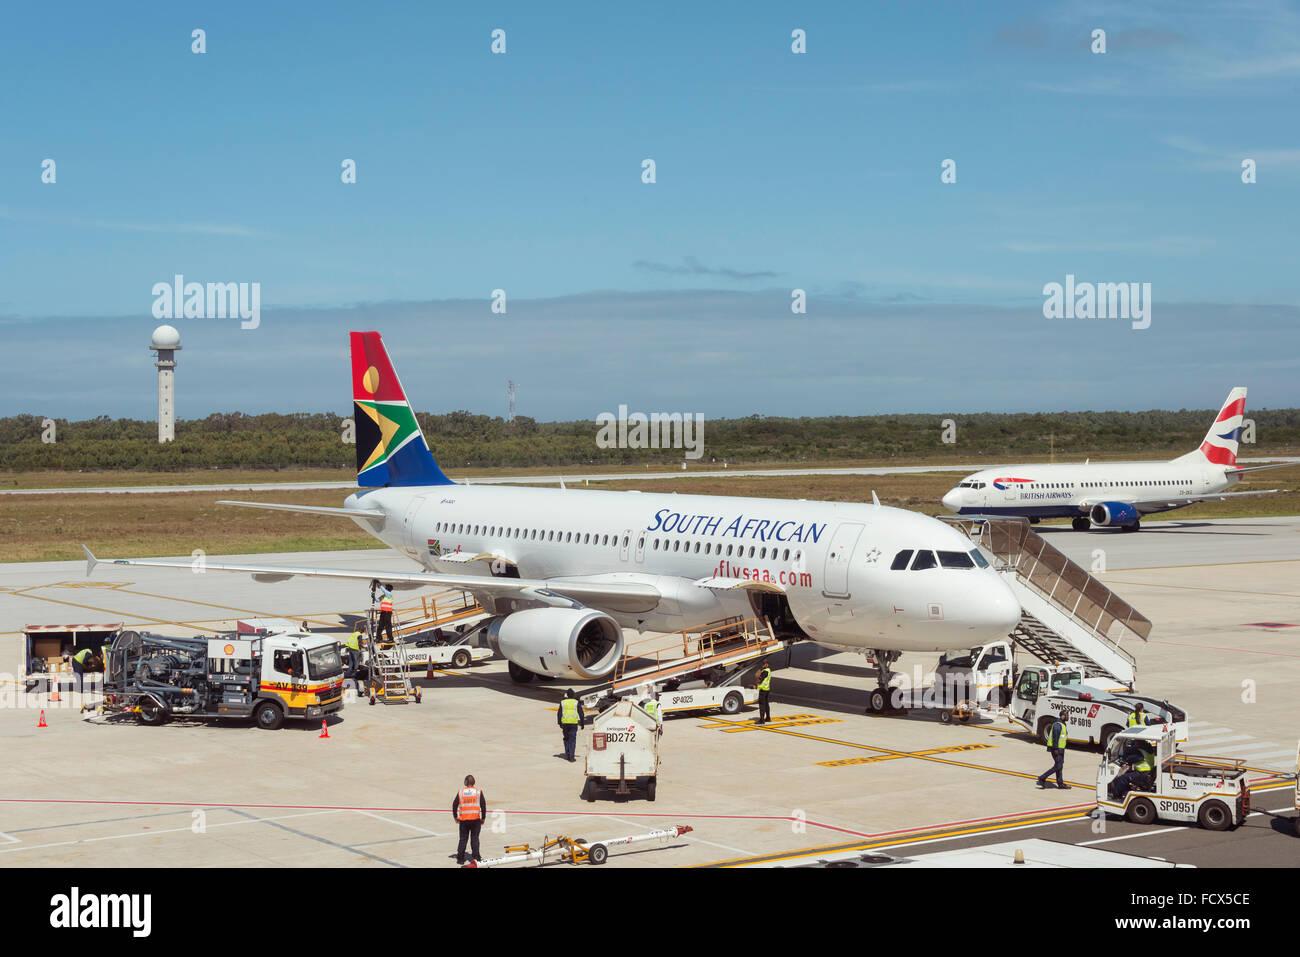 South African Airways Airbus A320, l'Aéroport International de Port Elizabeth, Port Elizabeth, Eastern Photo Stock